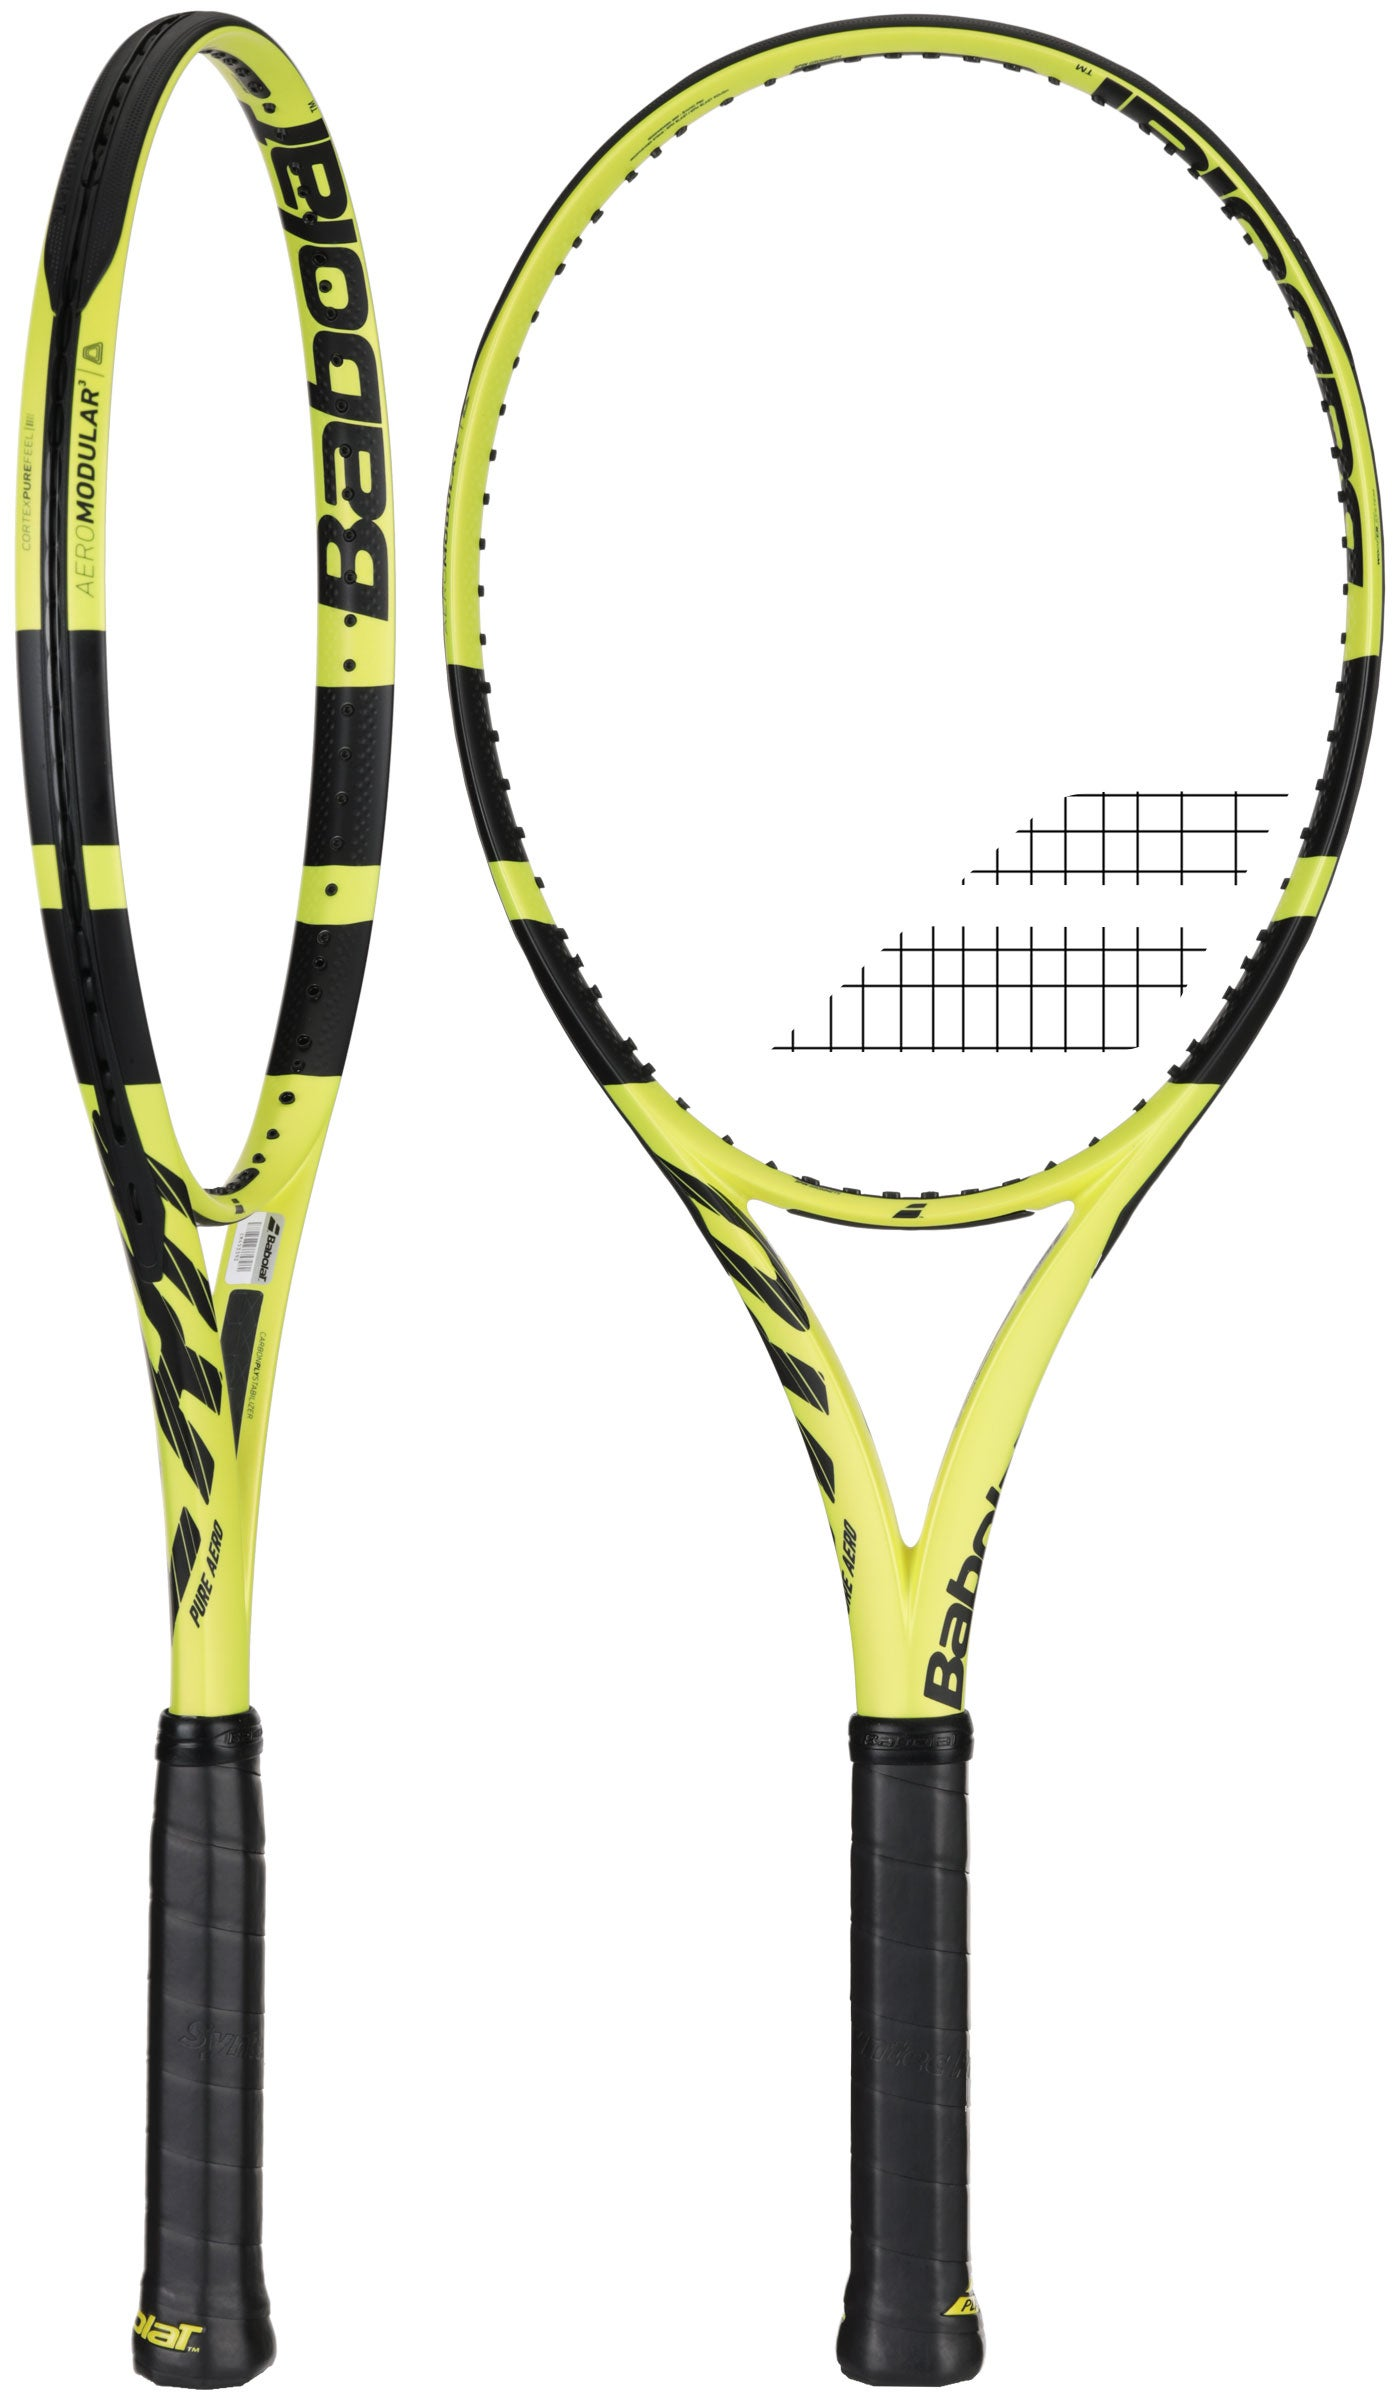 Babolat Pure Aero Racket - Tennis Warehouse Europe